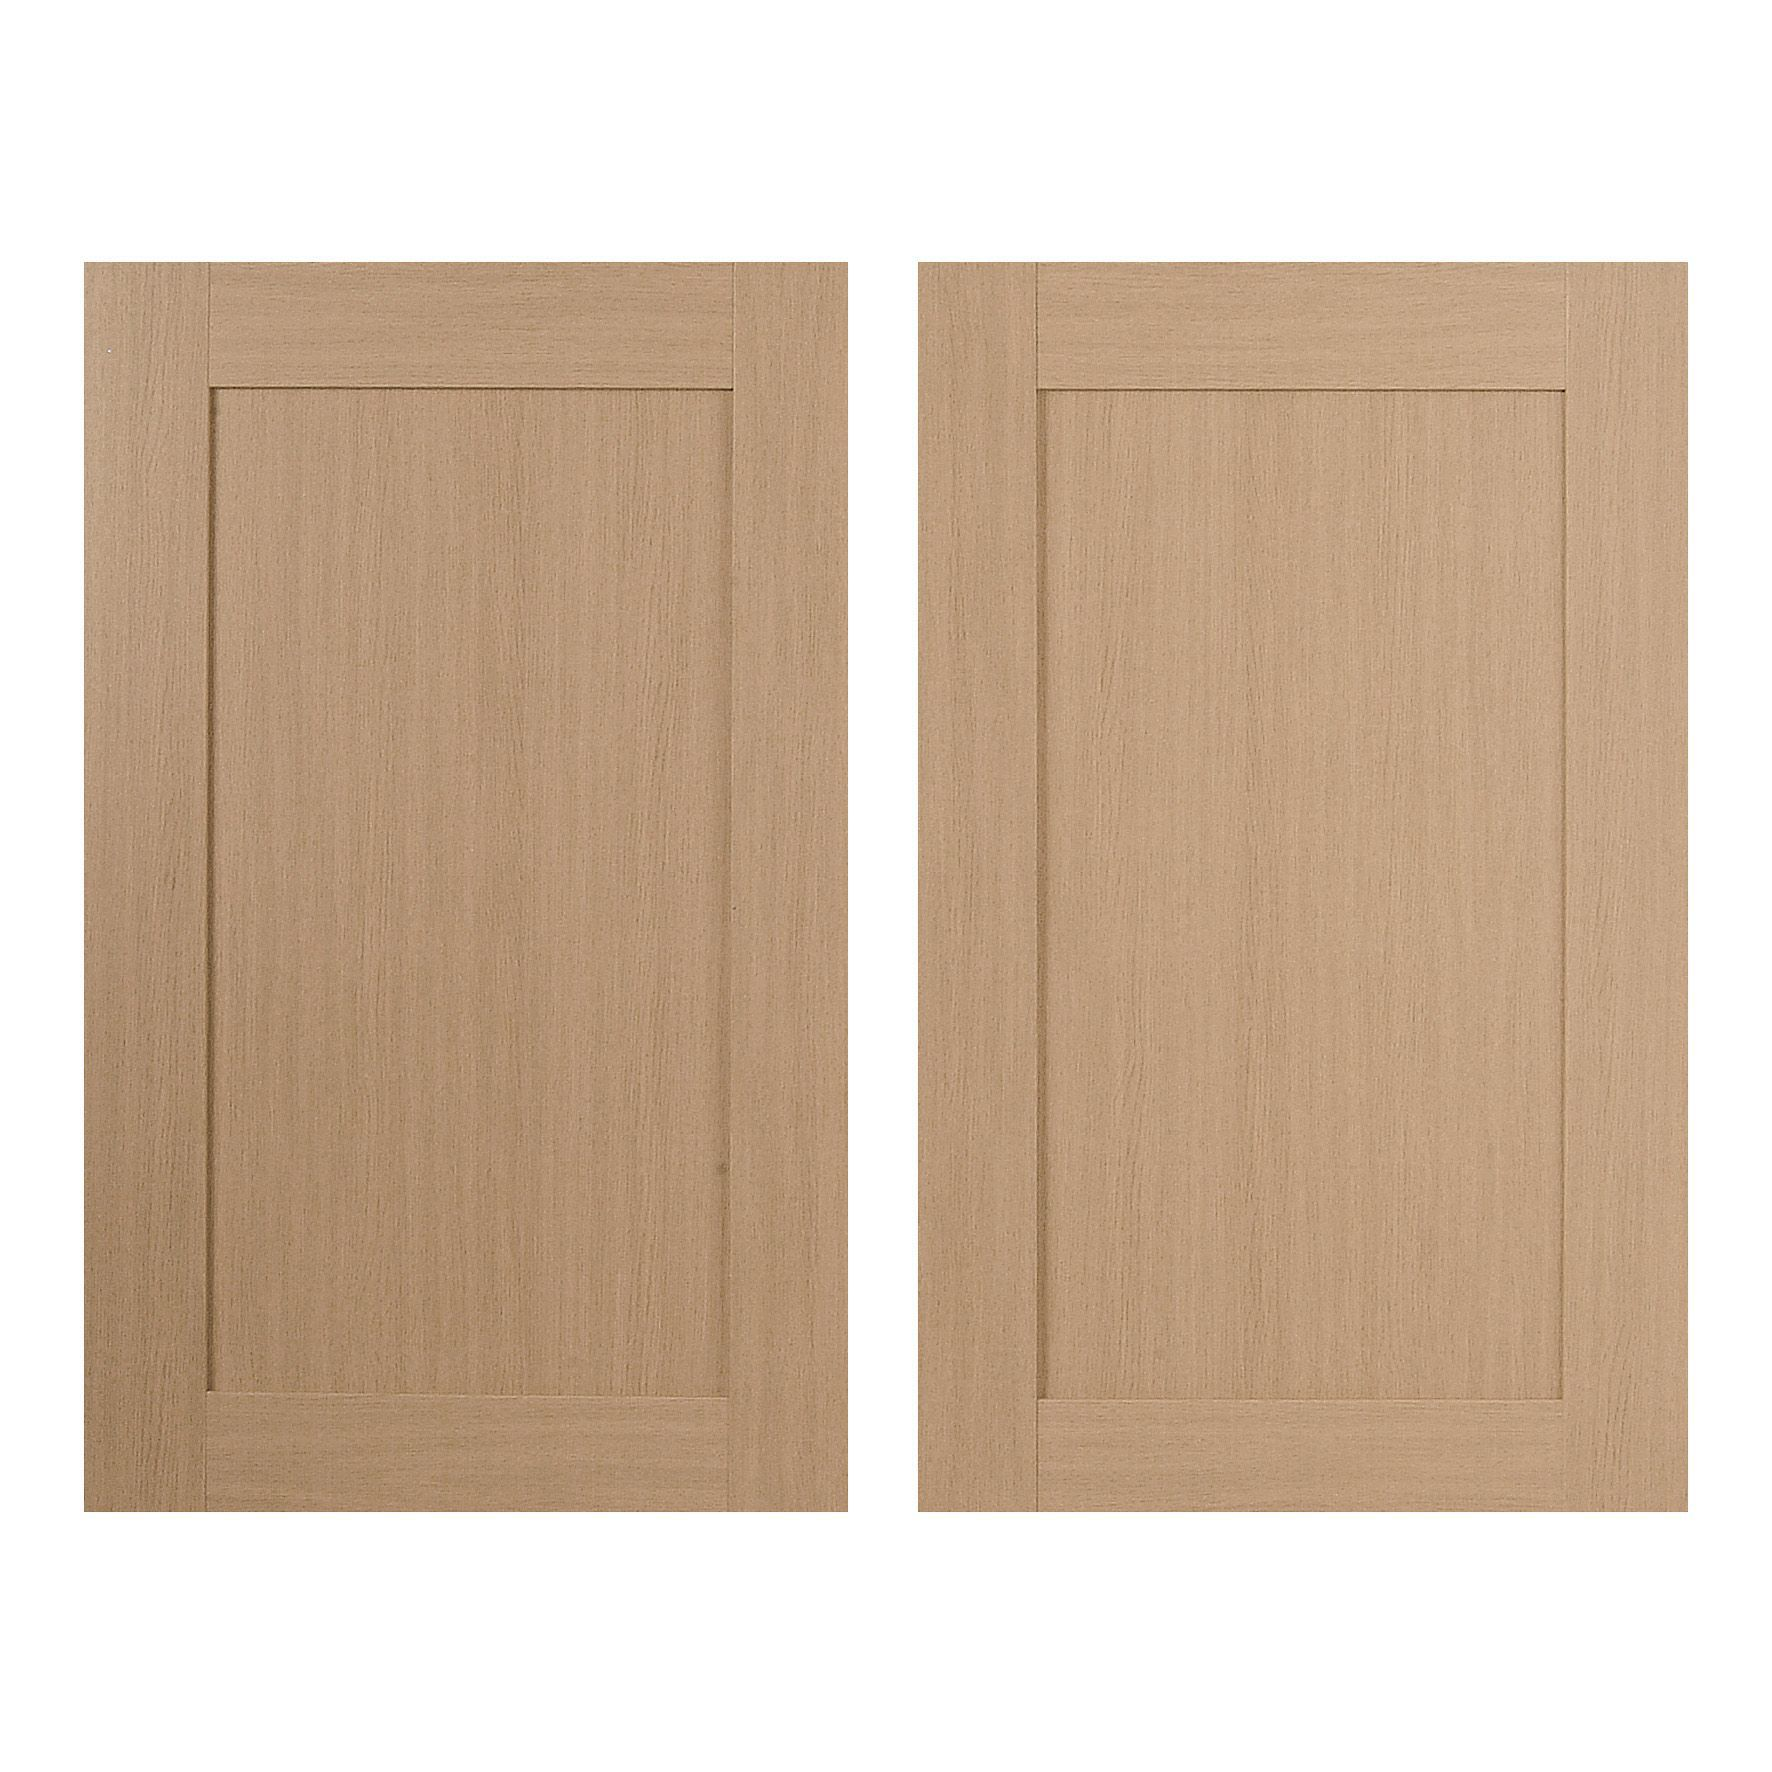 It Kitchens Westleigh Textured Oak Effect Shaker Larder Door (w)600mm, Set Of 2